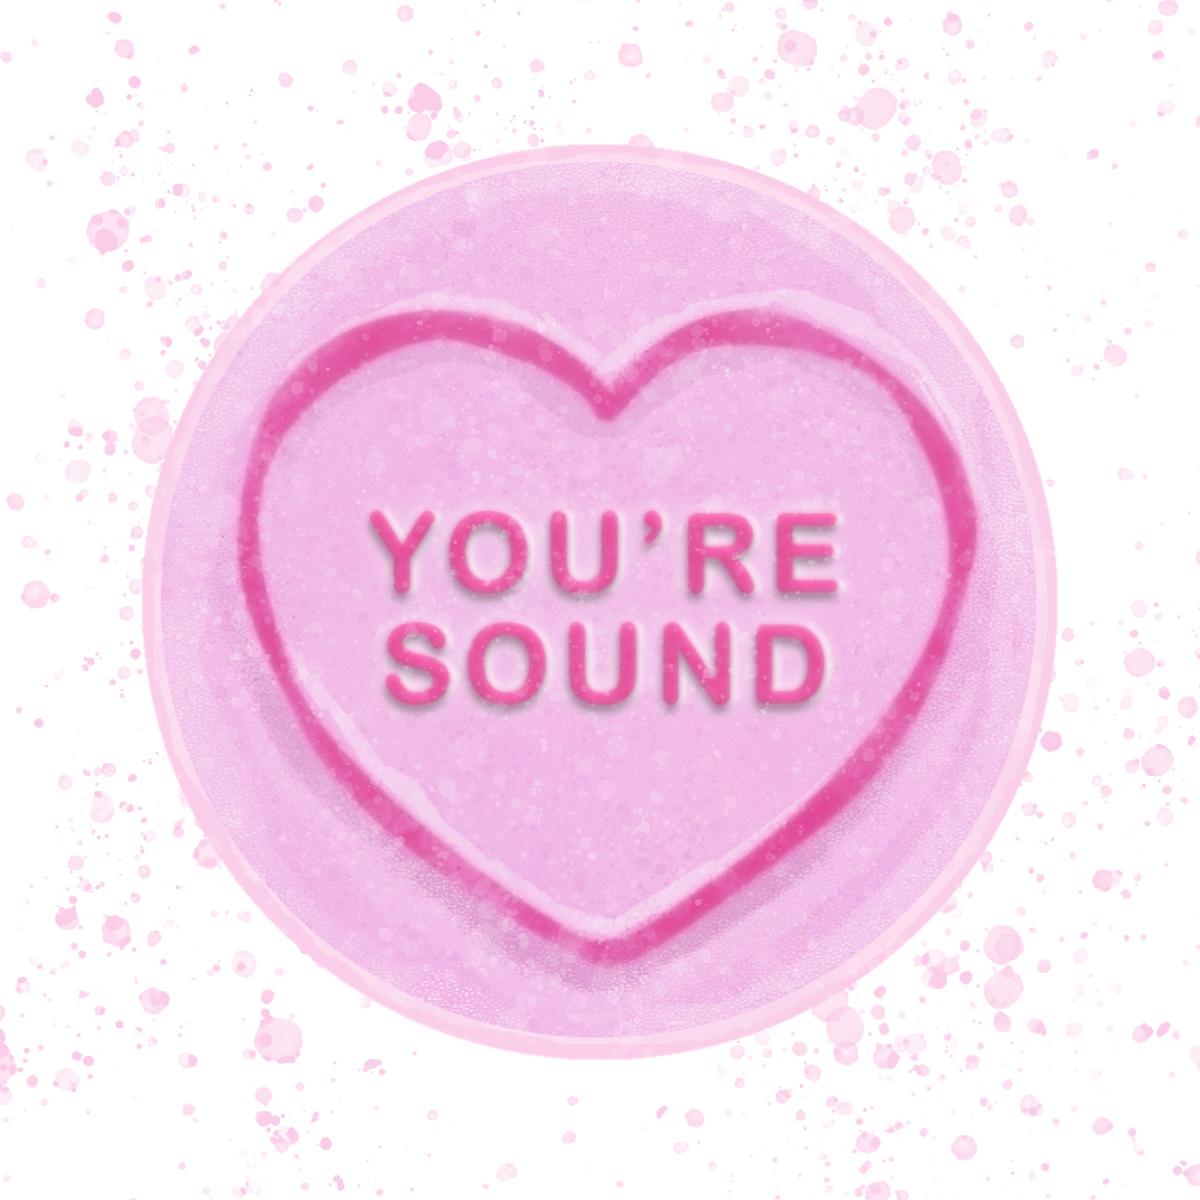 You're Sound Love Heart Final.jpg